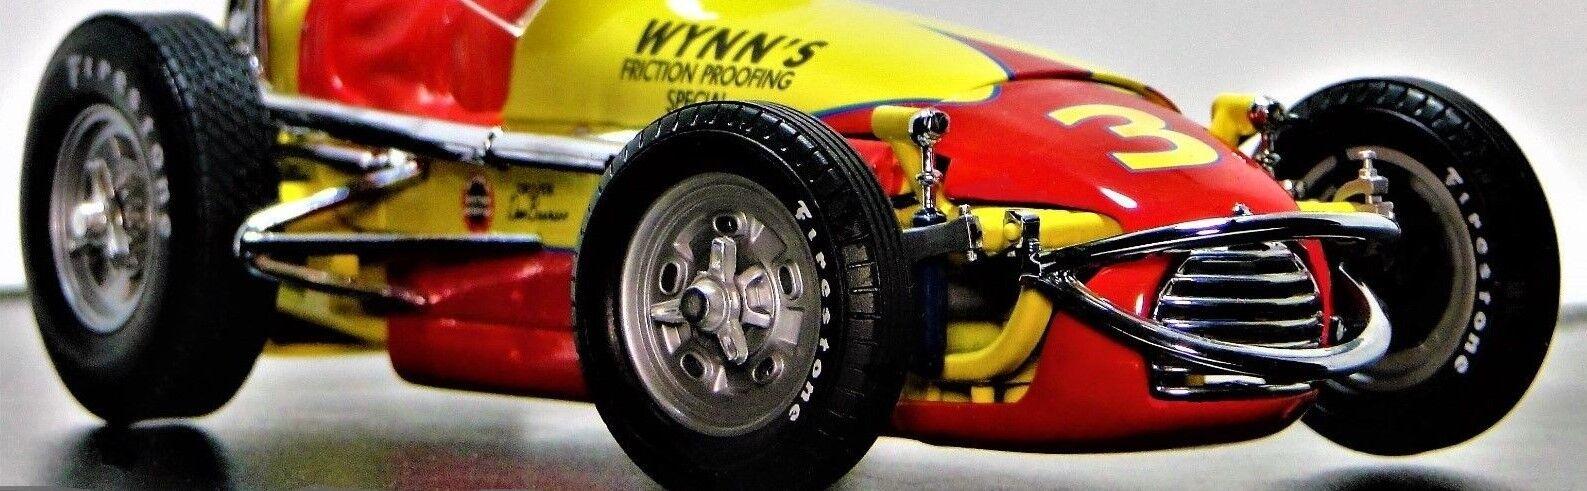 Race Car Ferrari F 1 1 1 GP 18 1960s 43 Vintage 24 Carousel Red 12 64 8 6484aa